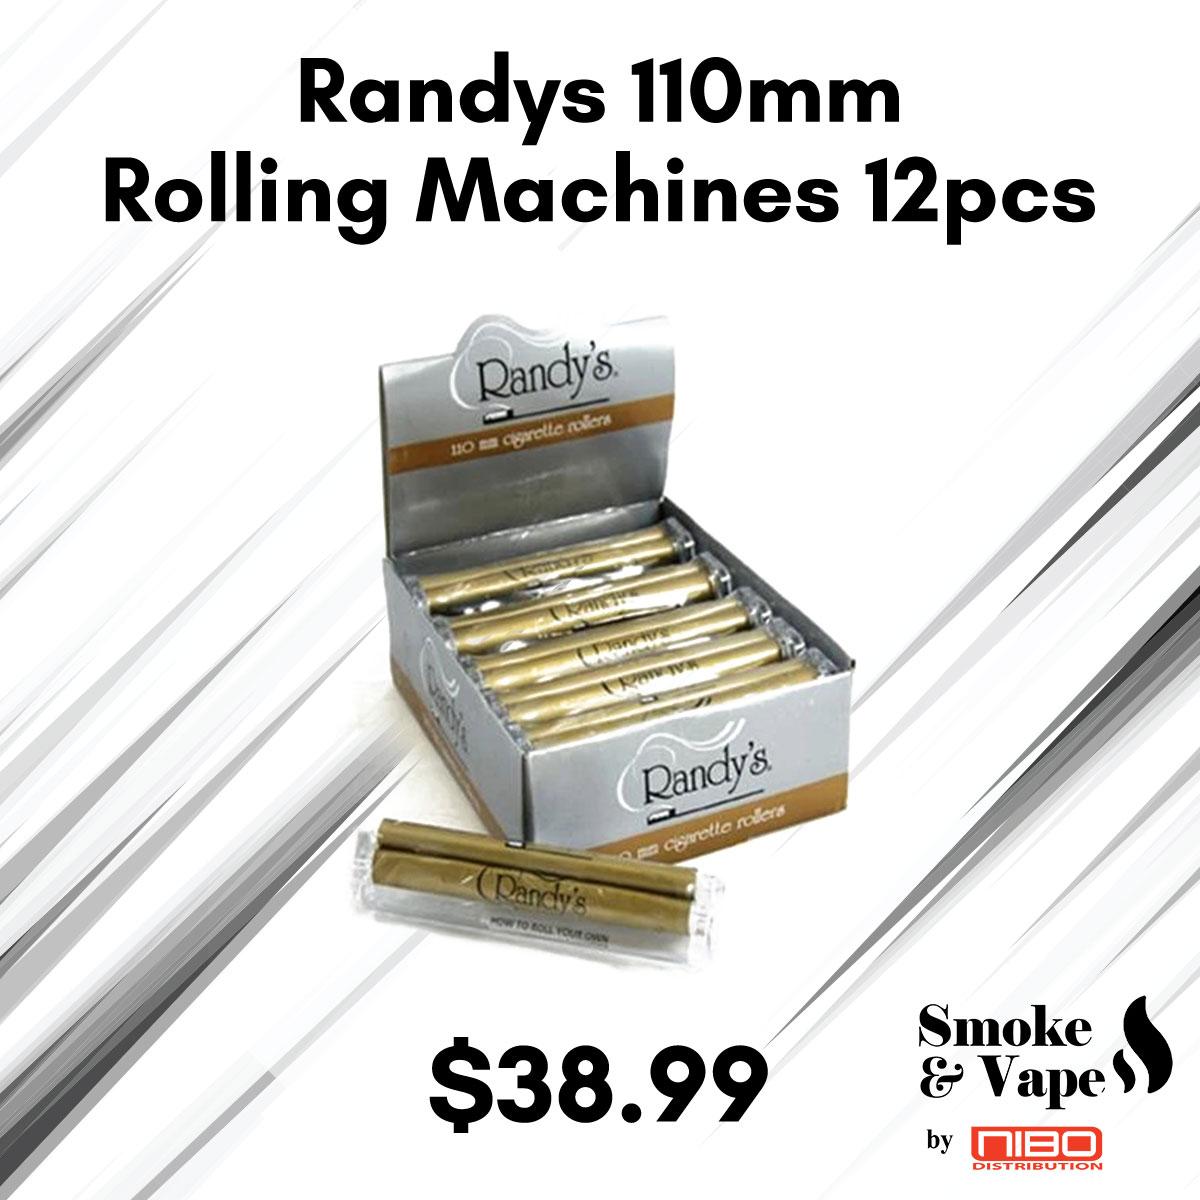 Randys 110mm Rolling Machines 12pcs  https://t.co/kyg4v8DLRE  #randays #Elements #RollingMachines #RawTubes #raw_rolling #tray #rawtray #smokeVape #smoking_accessory #rawtraymini #mini #mini_tray #canada #smoking #vaping #smokefans #vape #toronto_smoke_accessory https://t.co/jpGRdC36ee